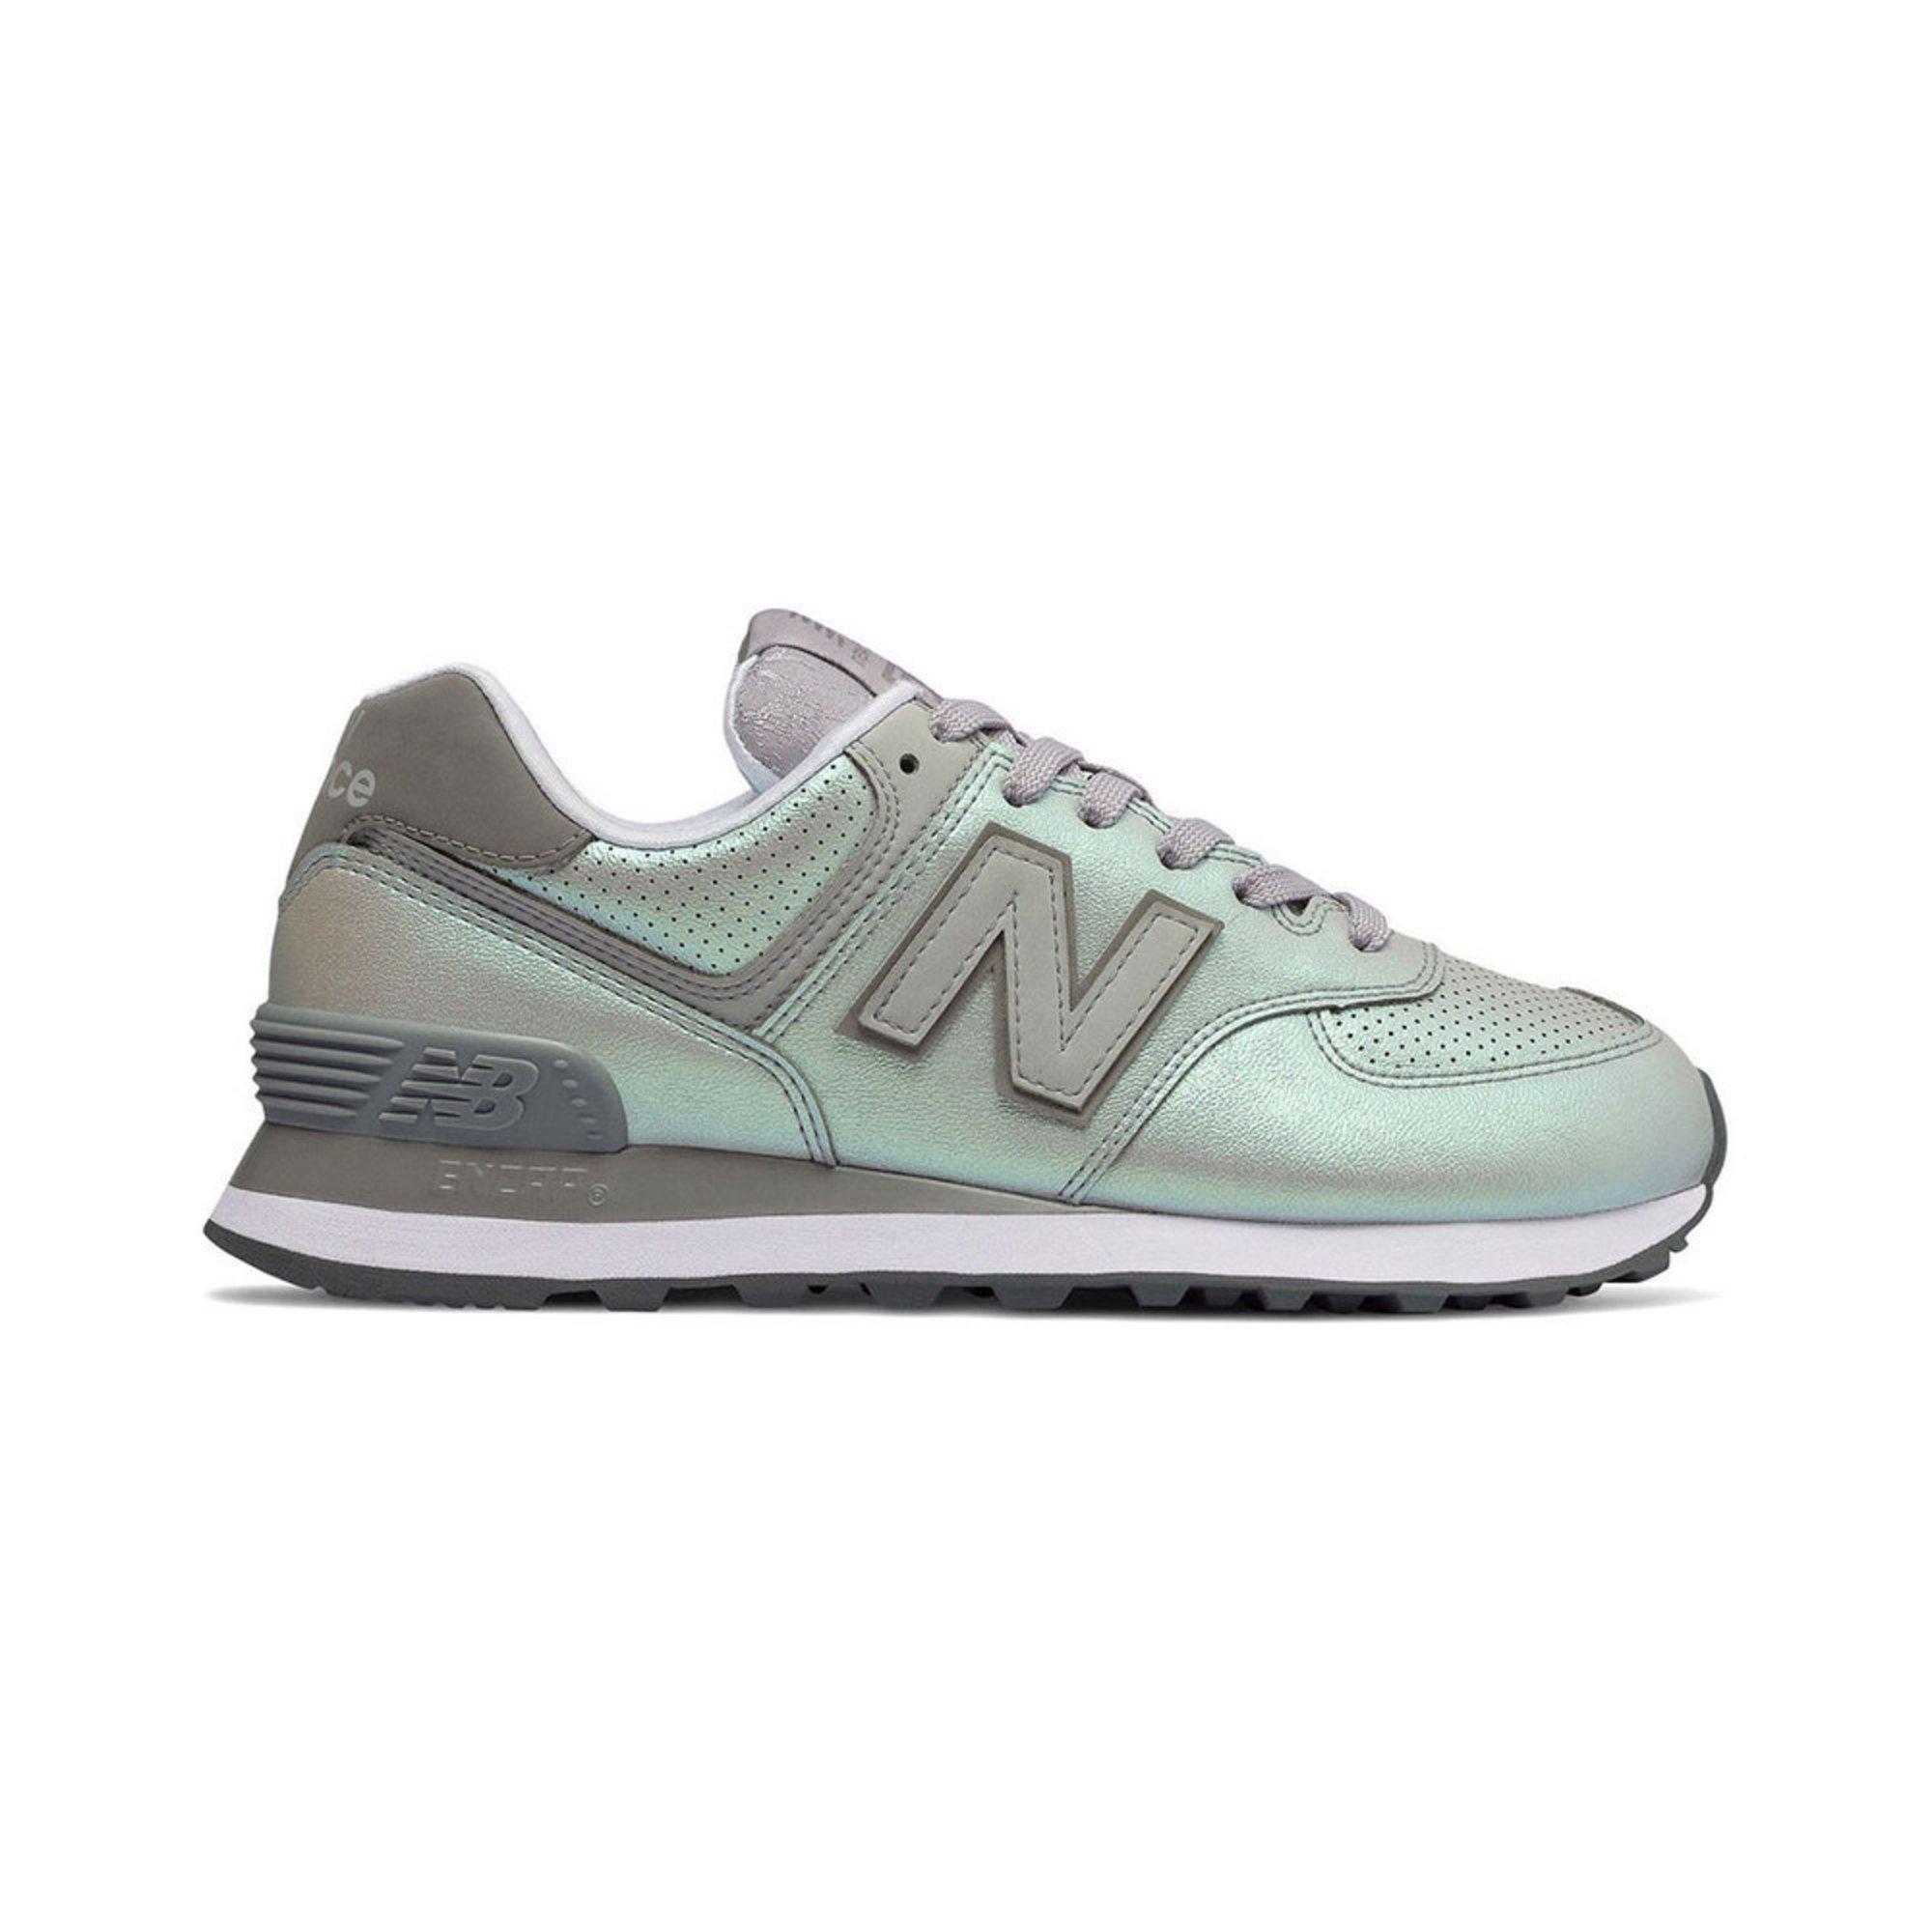 New Balance. New Balance Women s 574 Lifestyle Shoe 689a27e8497